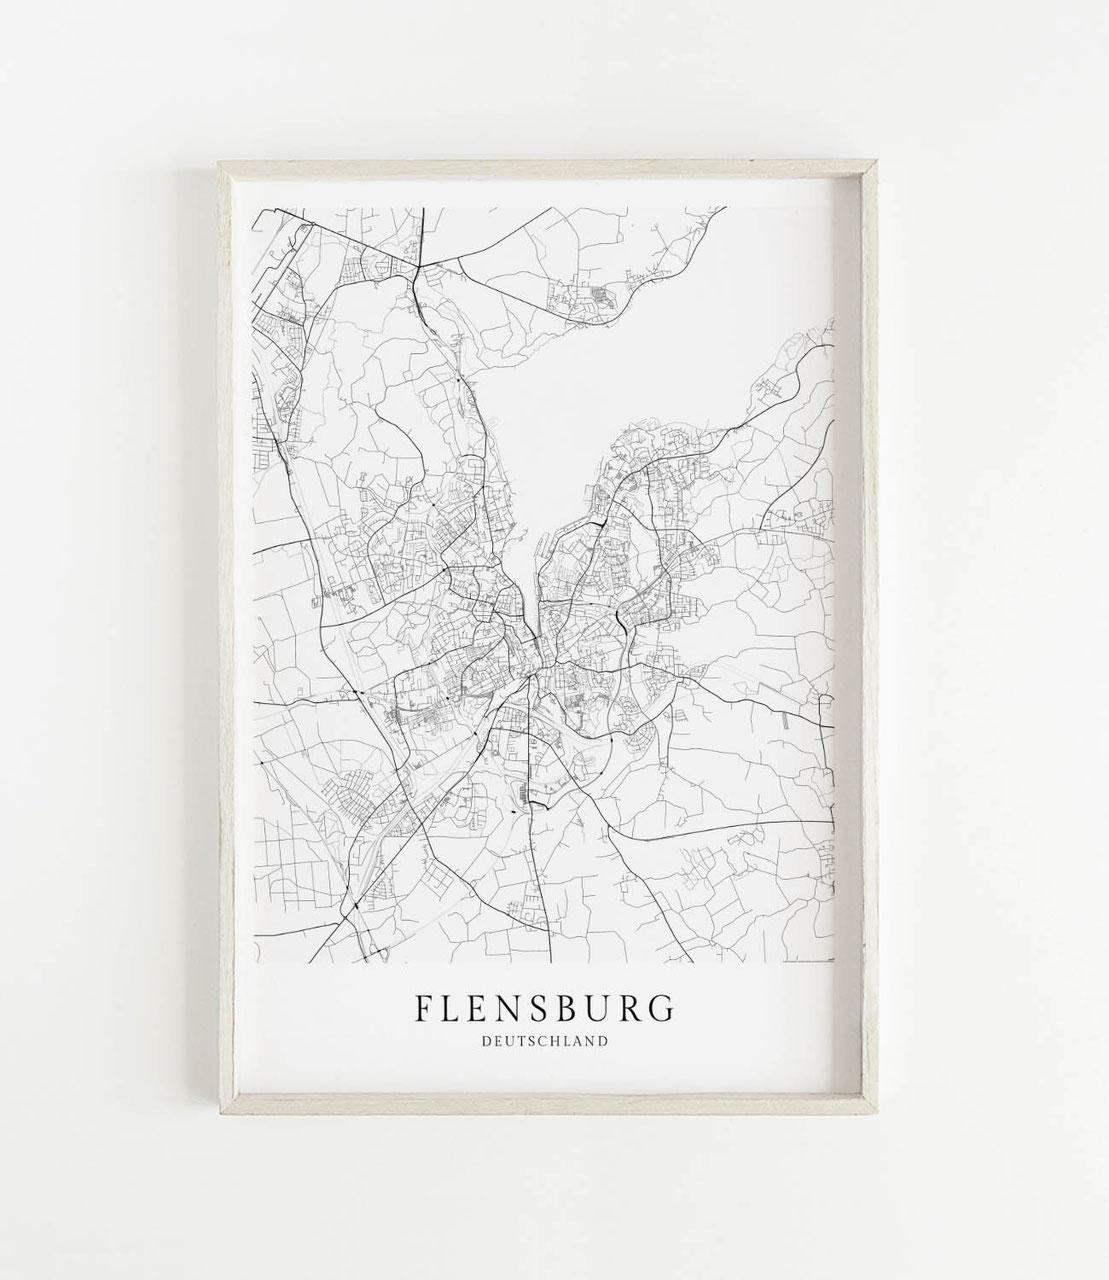 Flensburg Karte Als Poster Im Skandinavischen Stil Postermaps